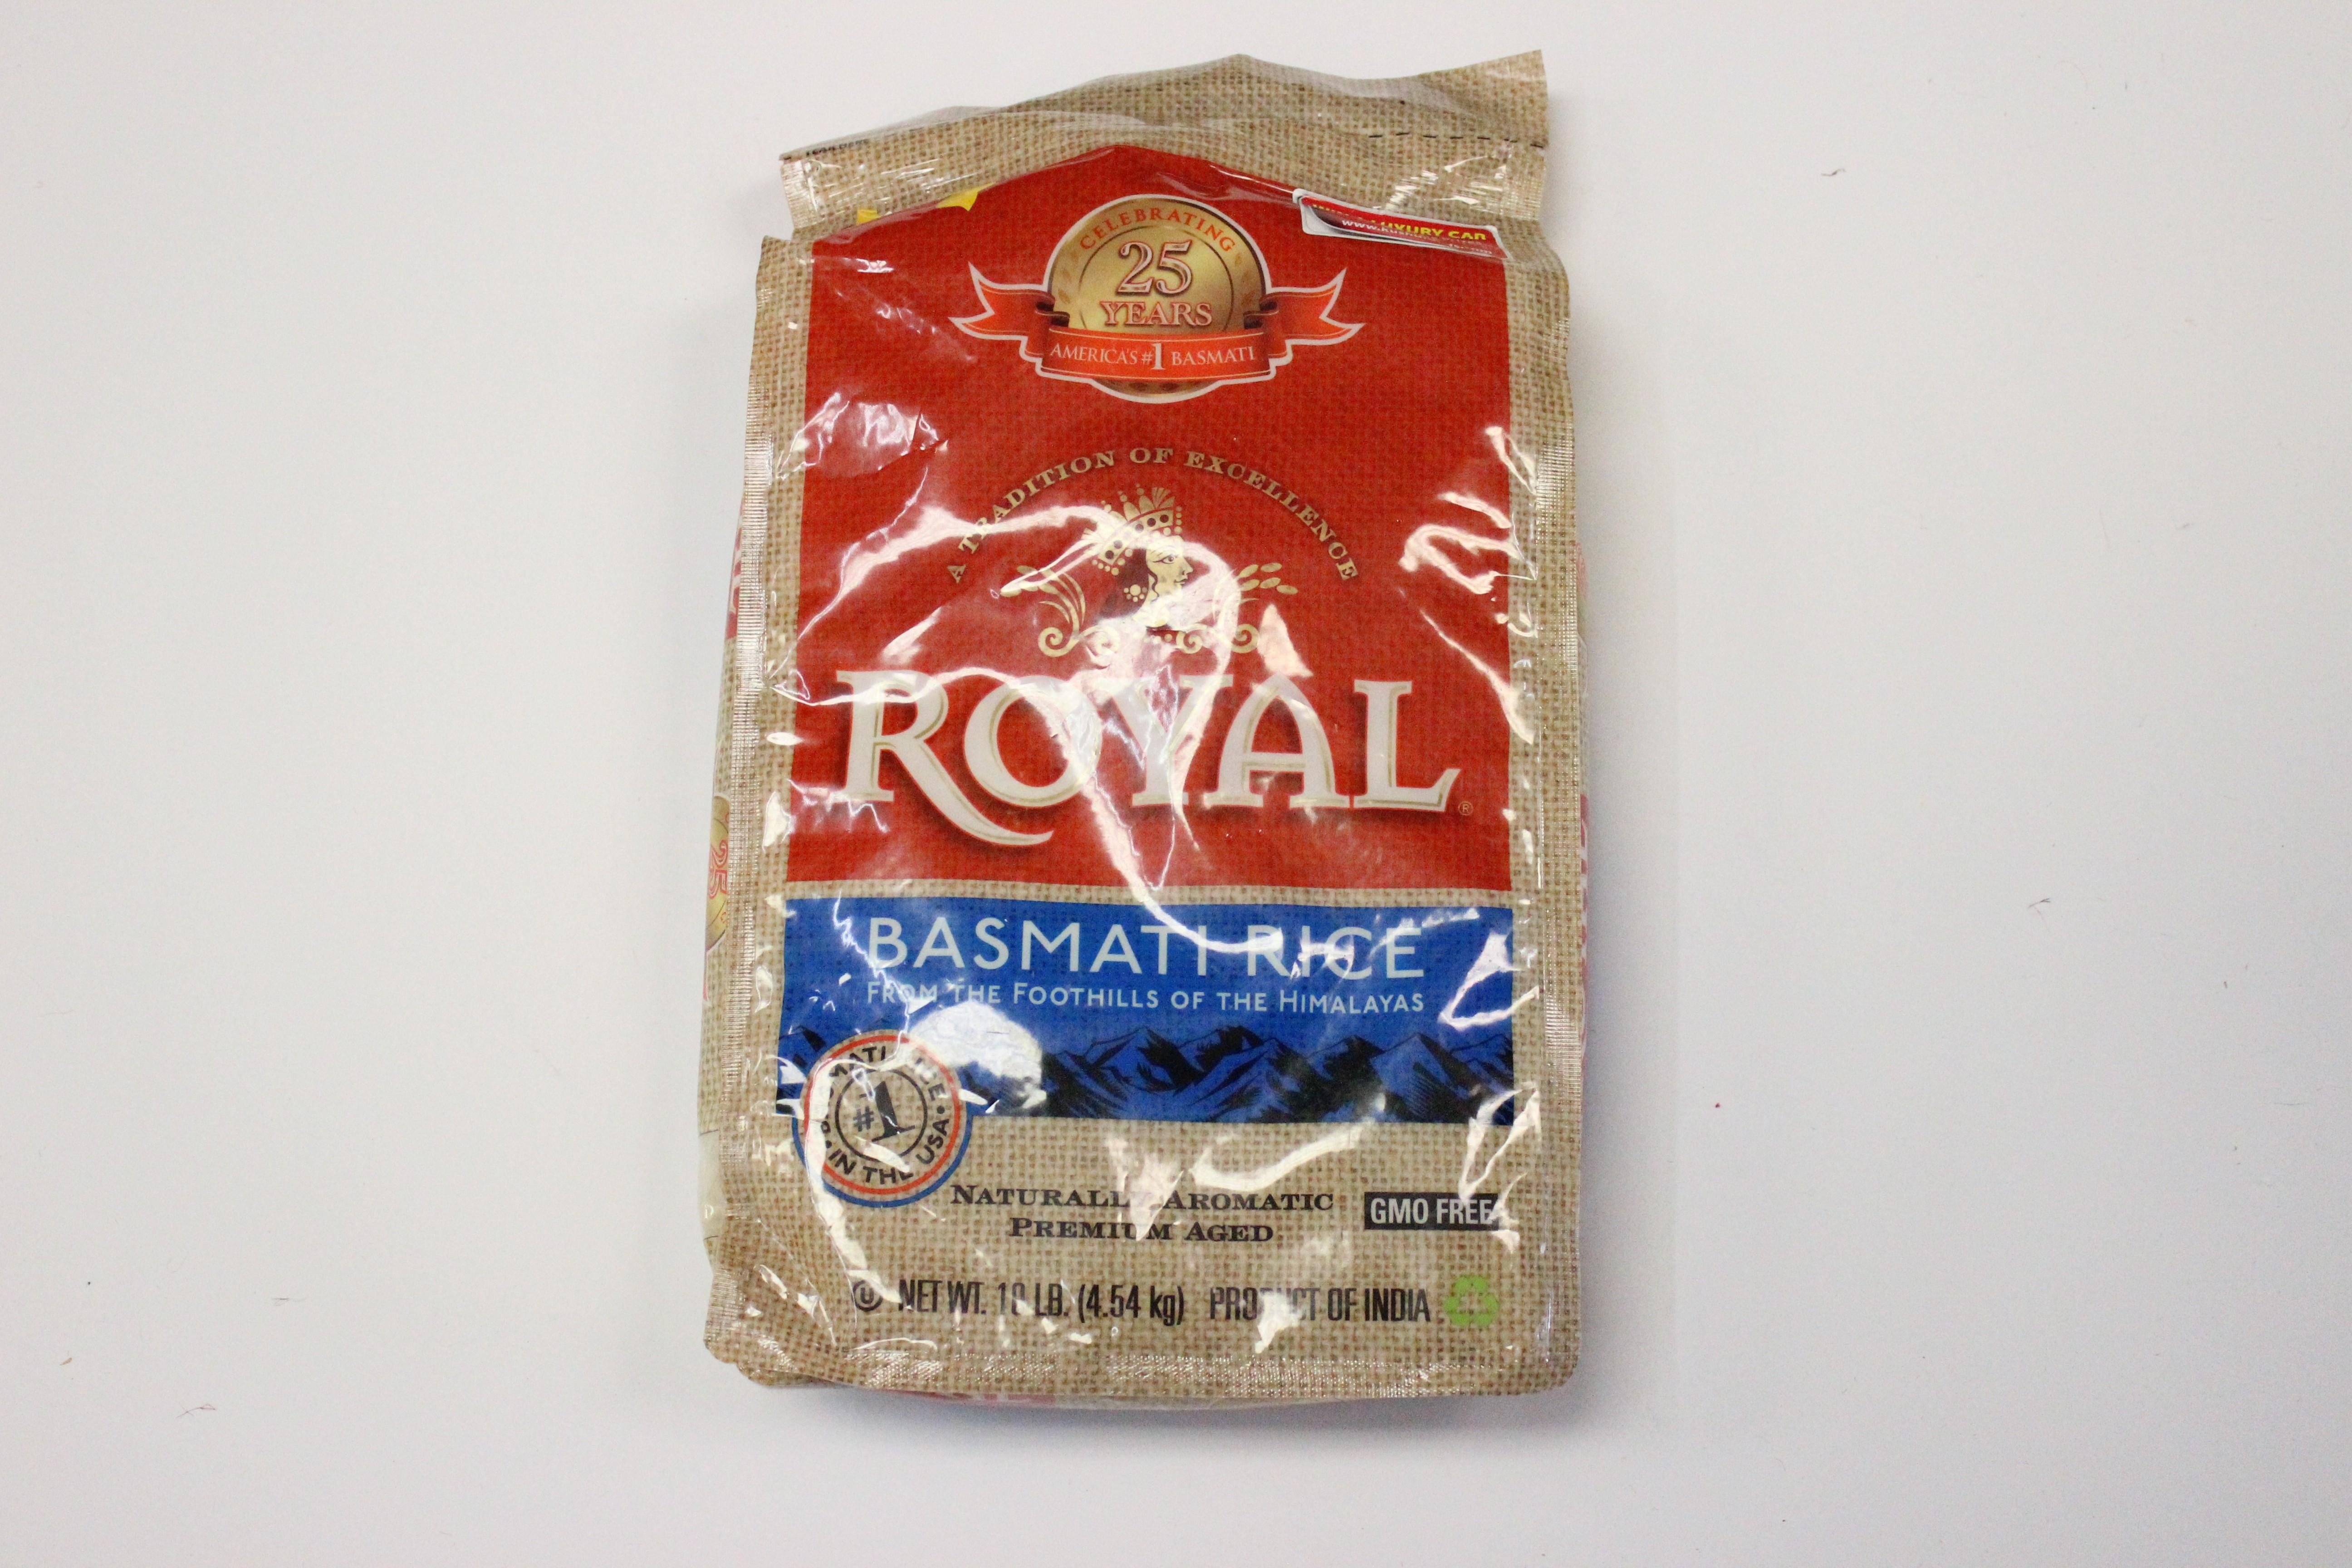 Royal Basmati Rice 10lb